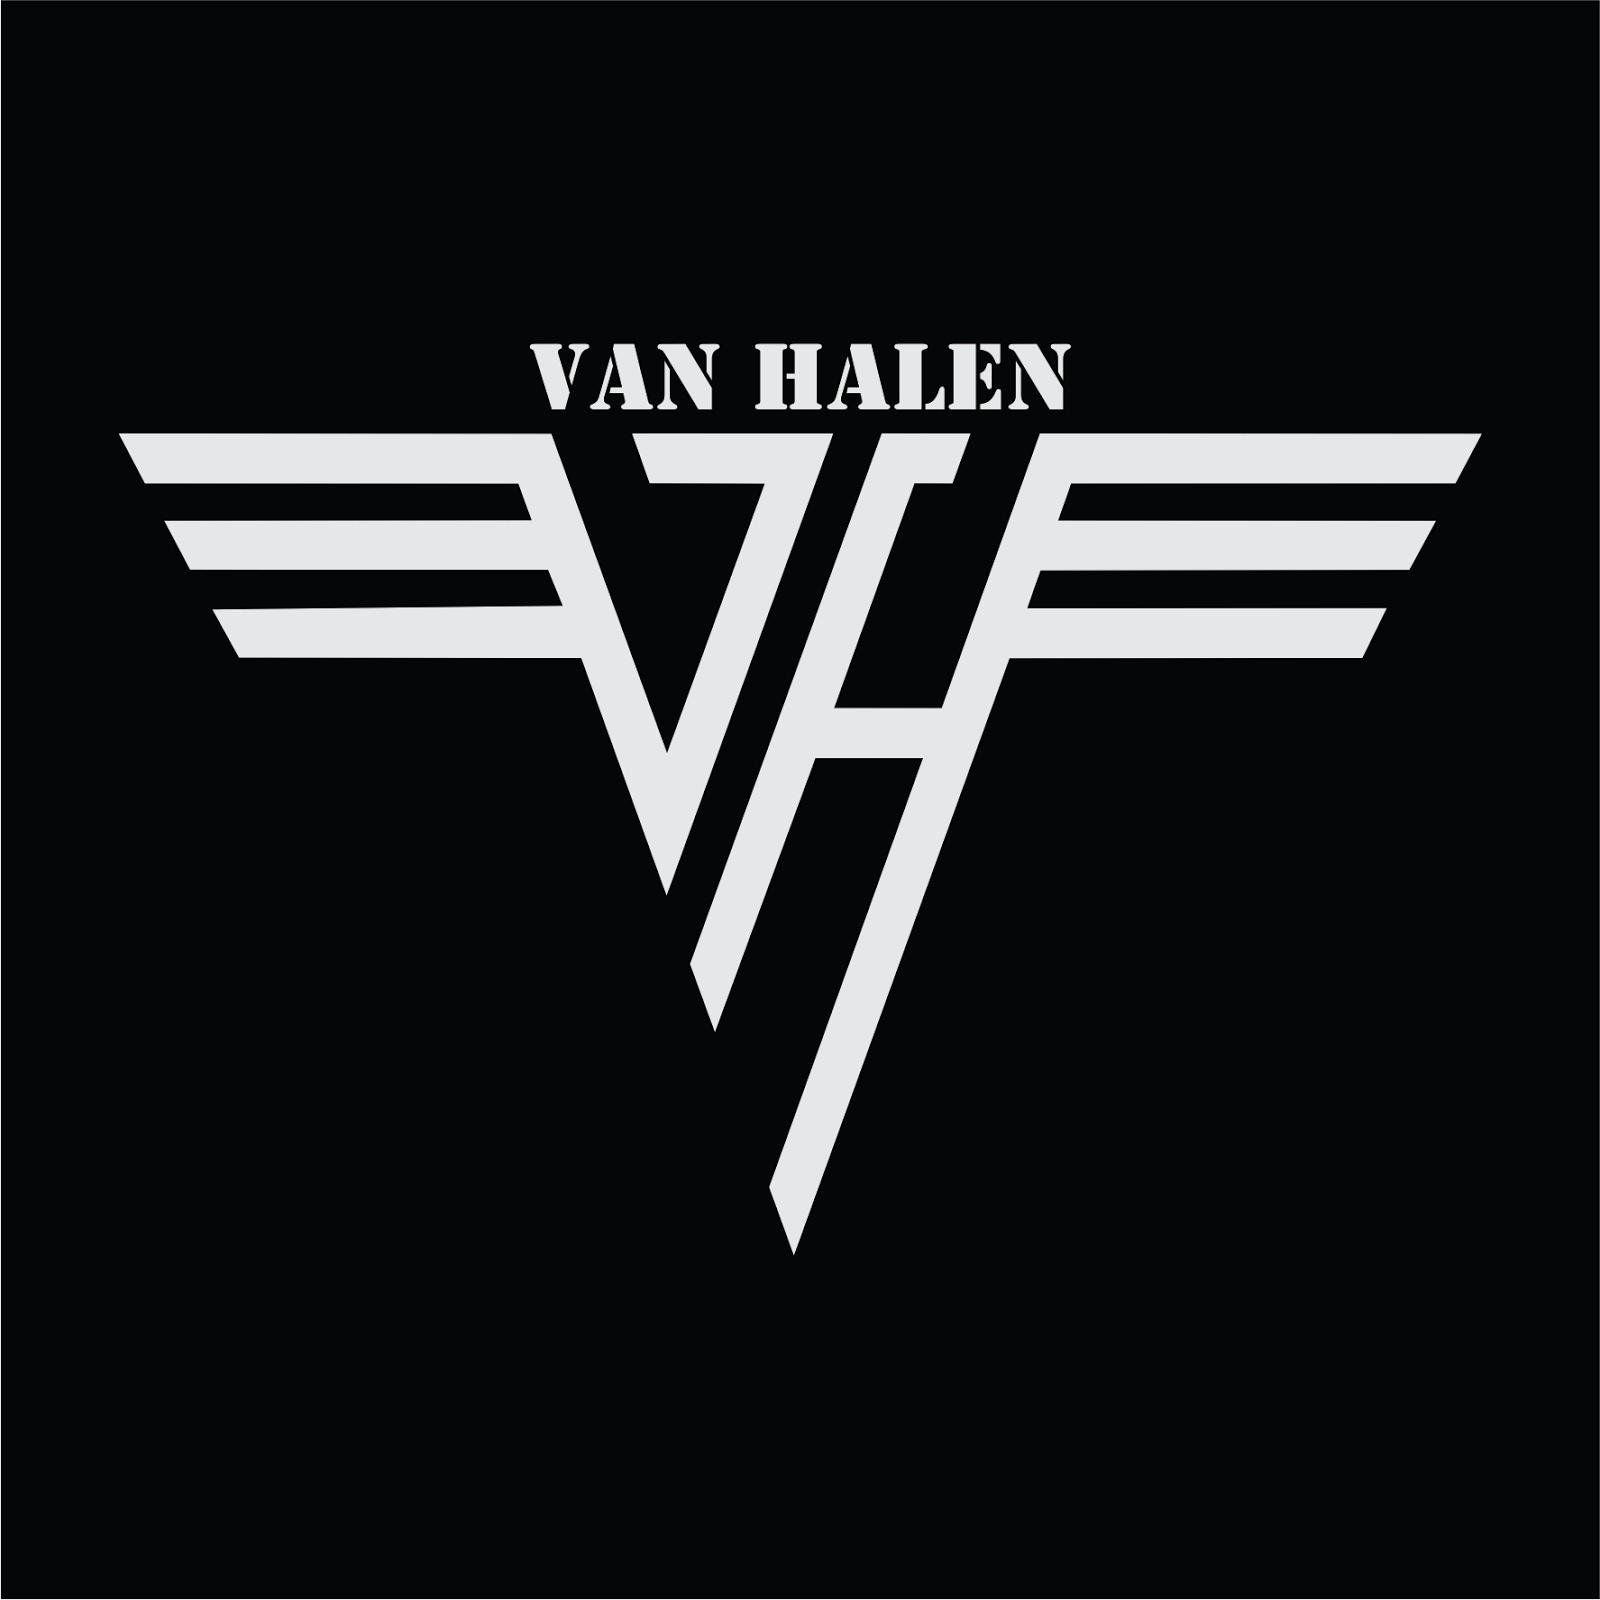 Van Halena Logo Free Download Vector CDR, AI, EPS and PNG Formats